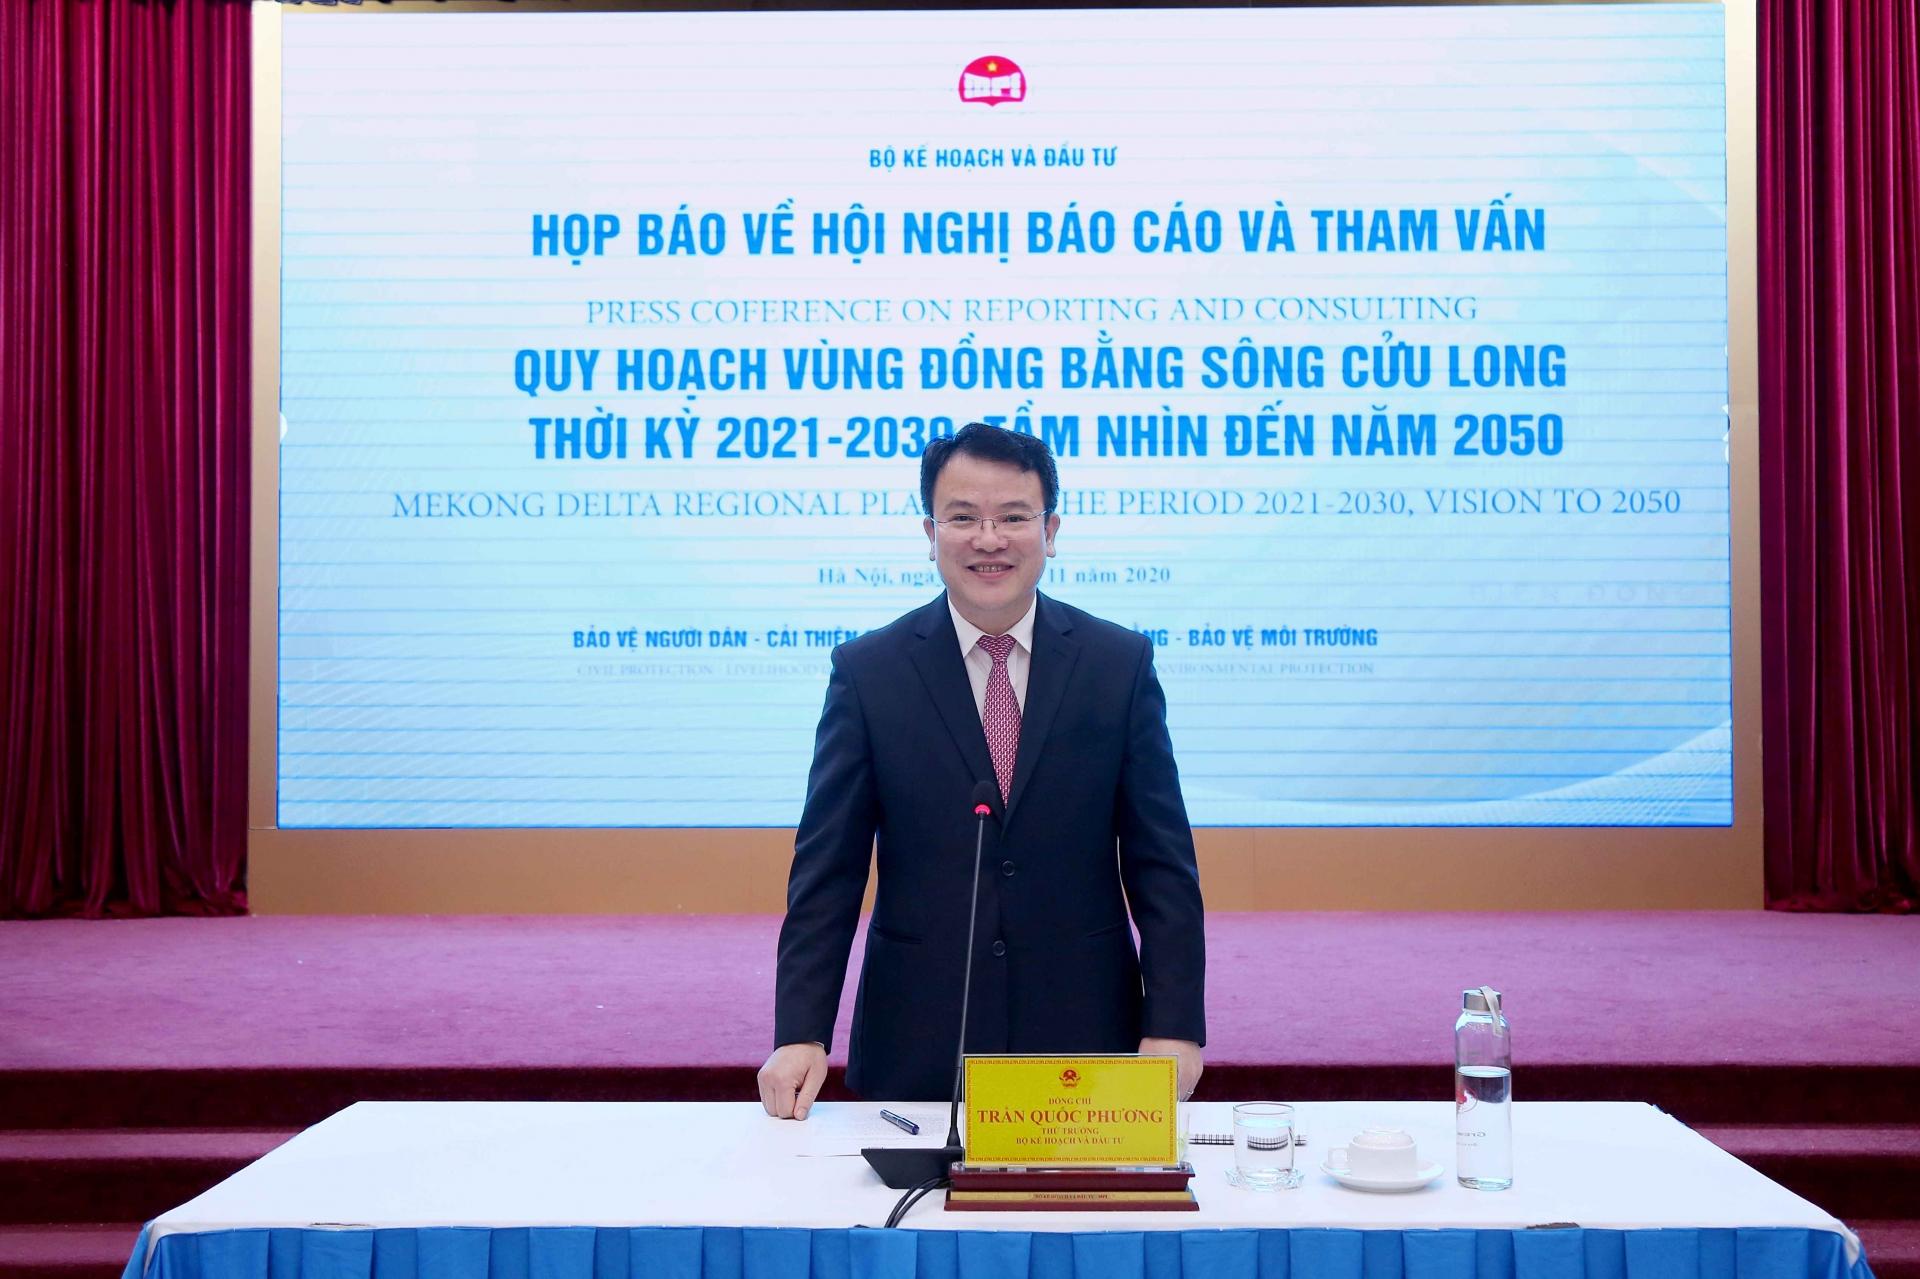 building mekong delta regional plan in 2021 2030 vision to 2050